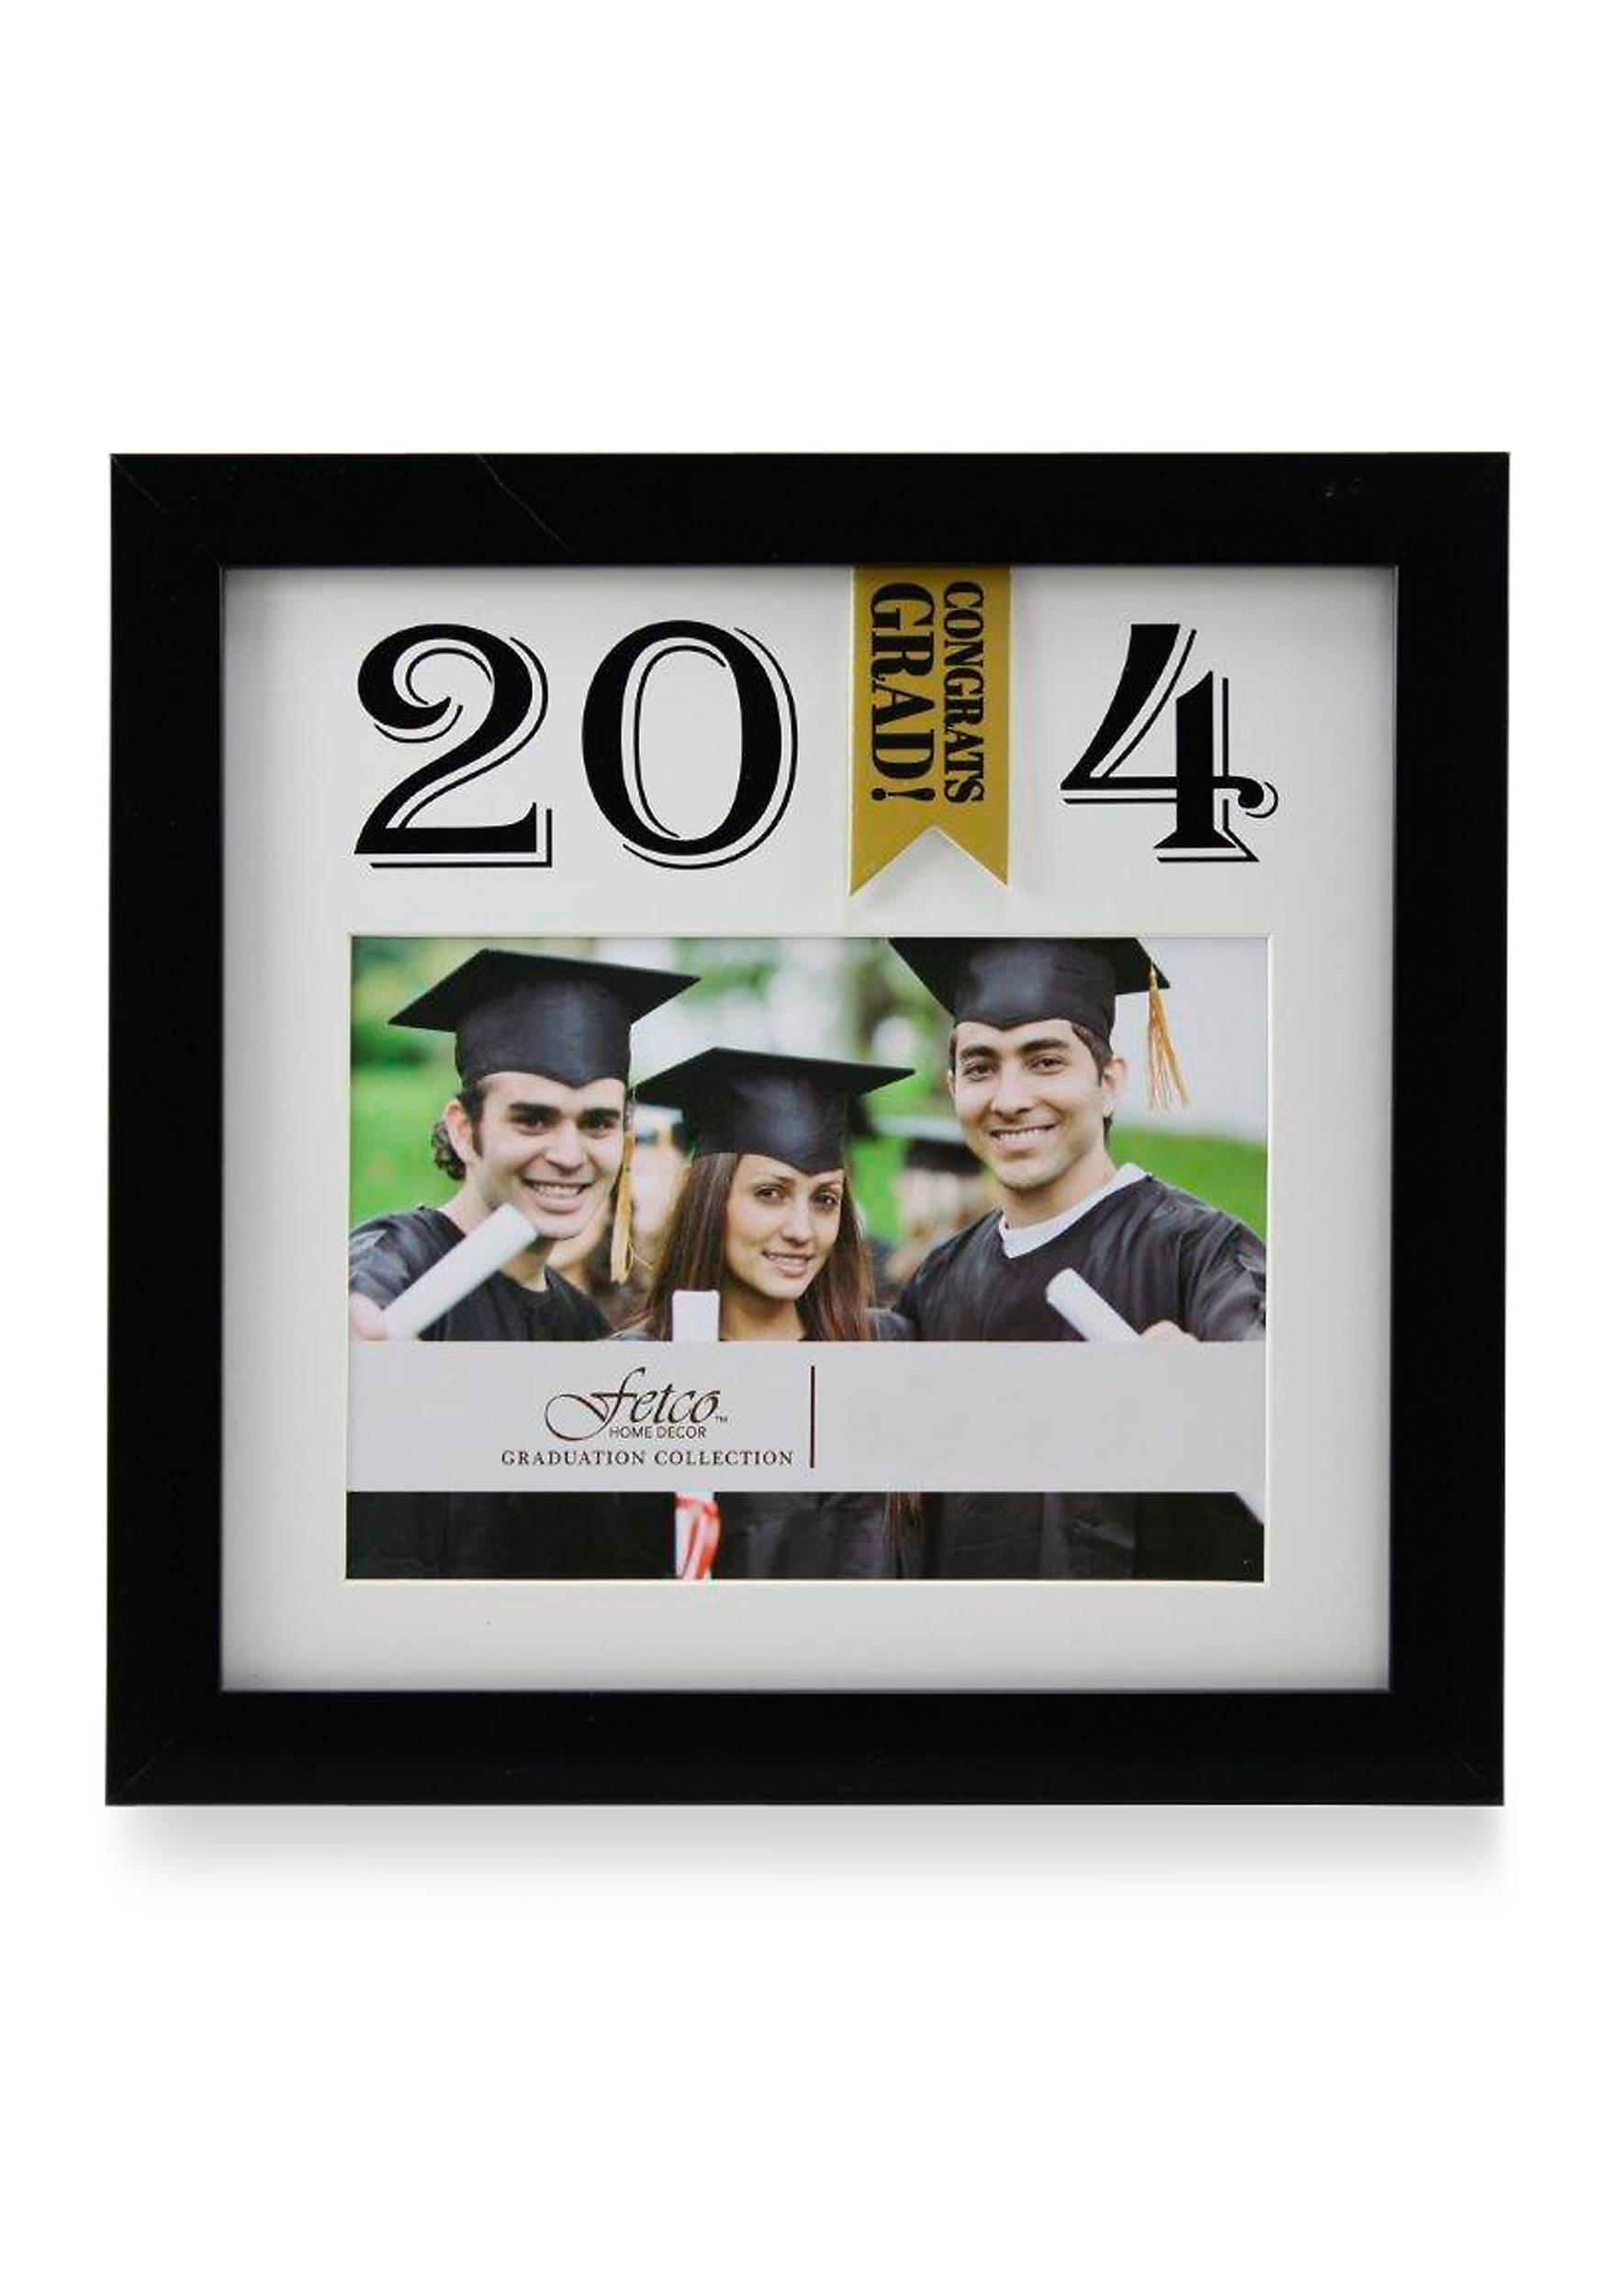 Fetco home dcor daymour congrats grad 2014 5x7 photo frame belk images jeuxipadfo Gallery